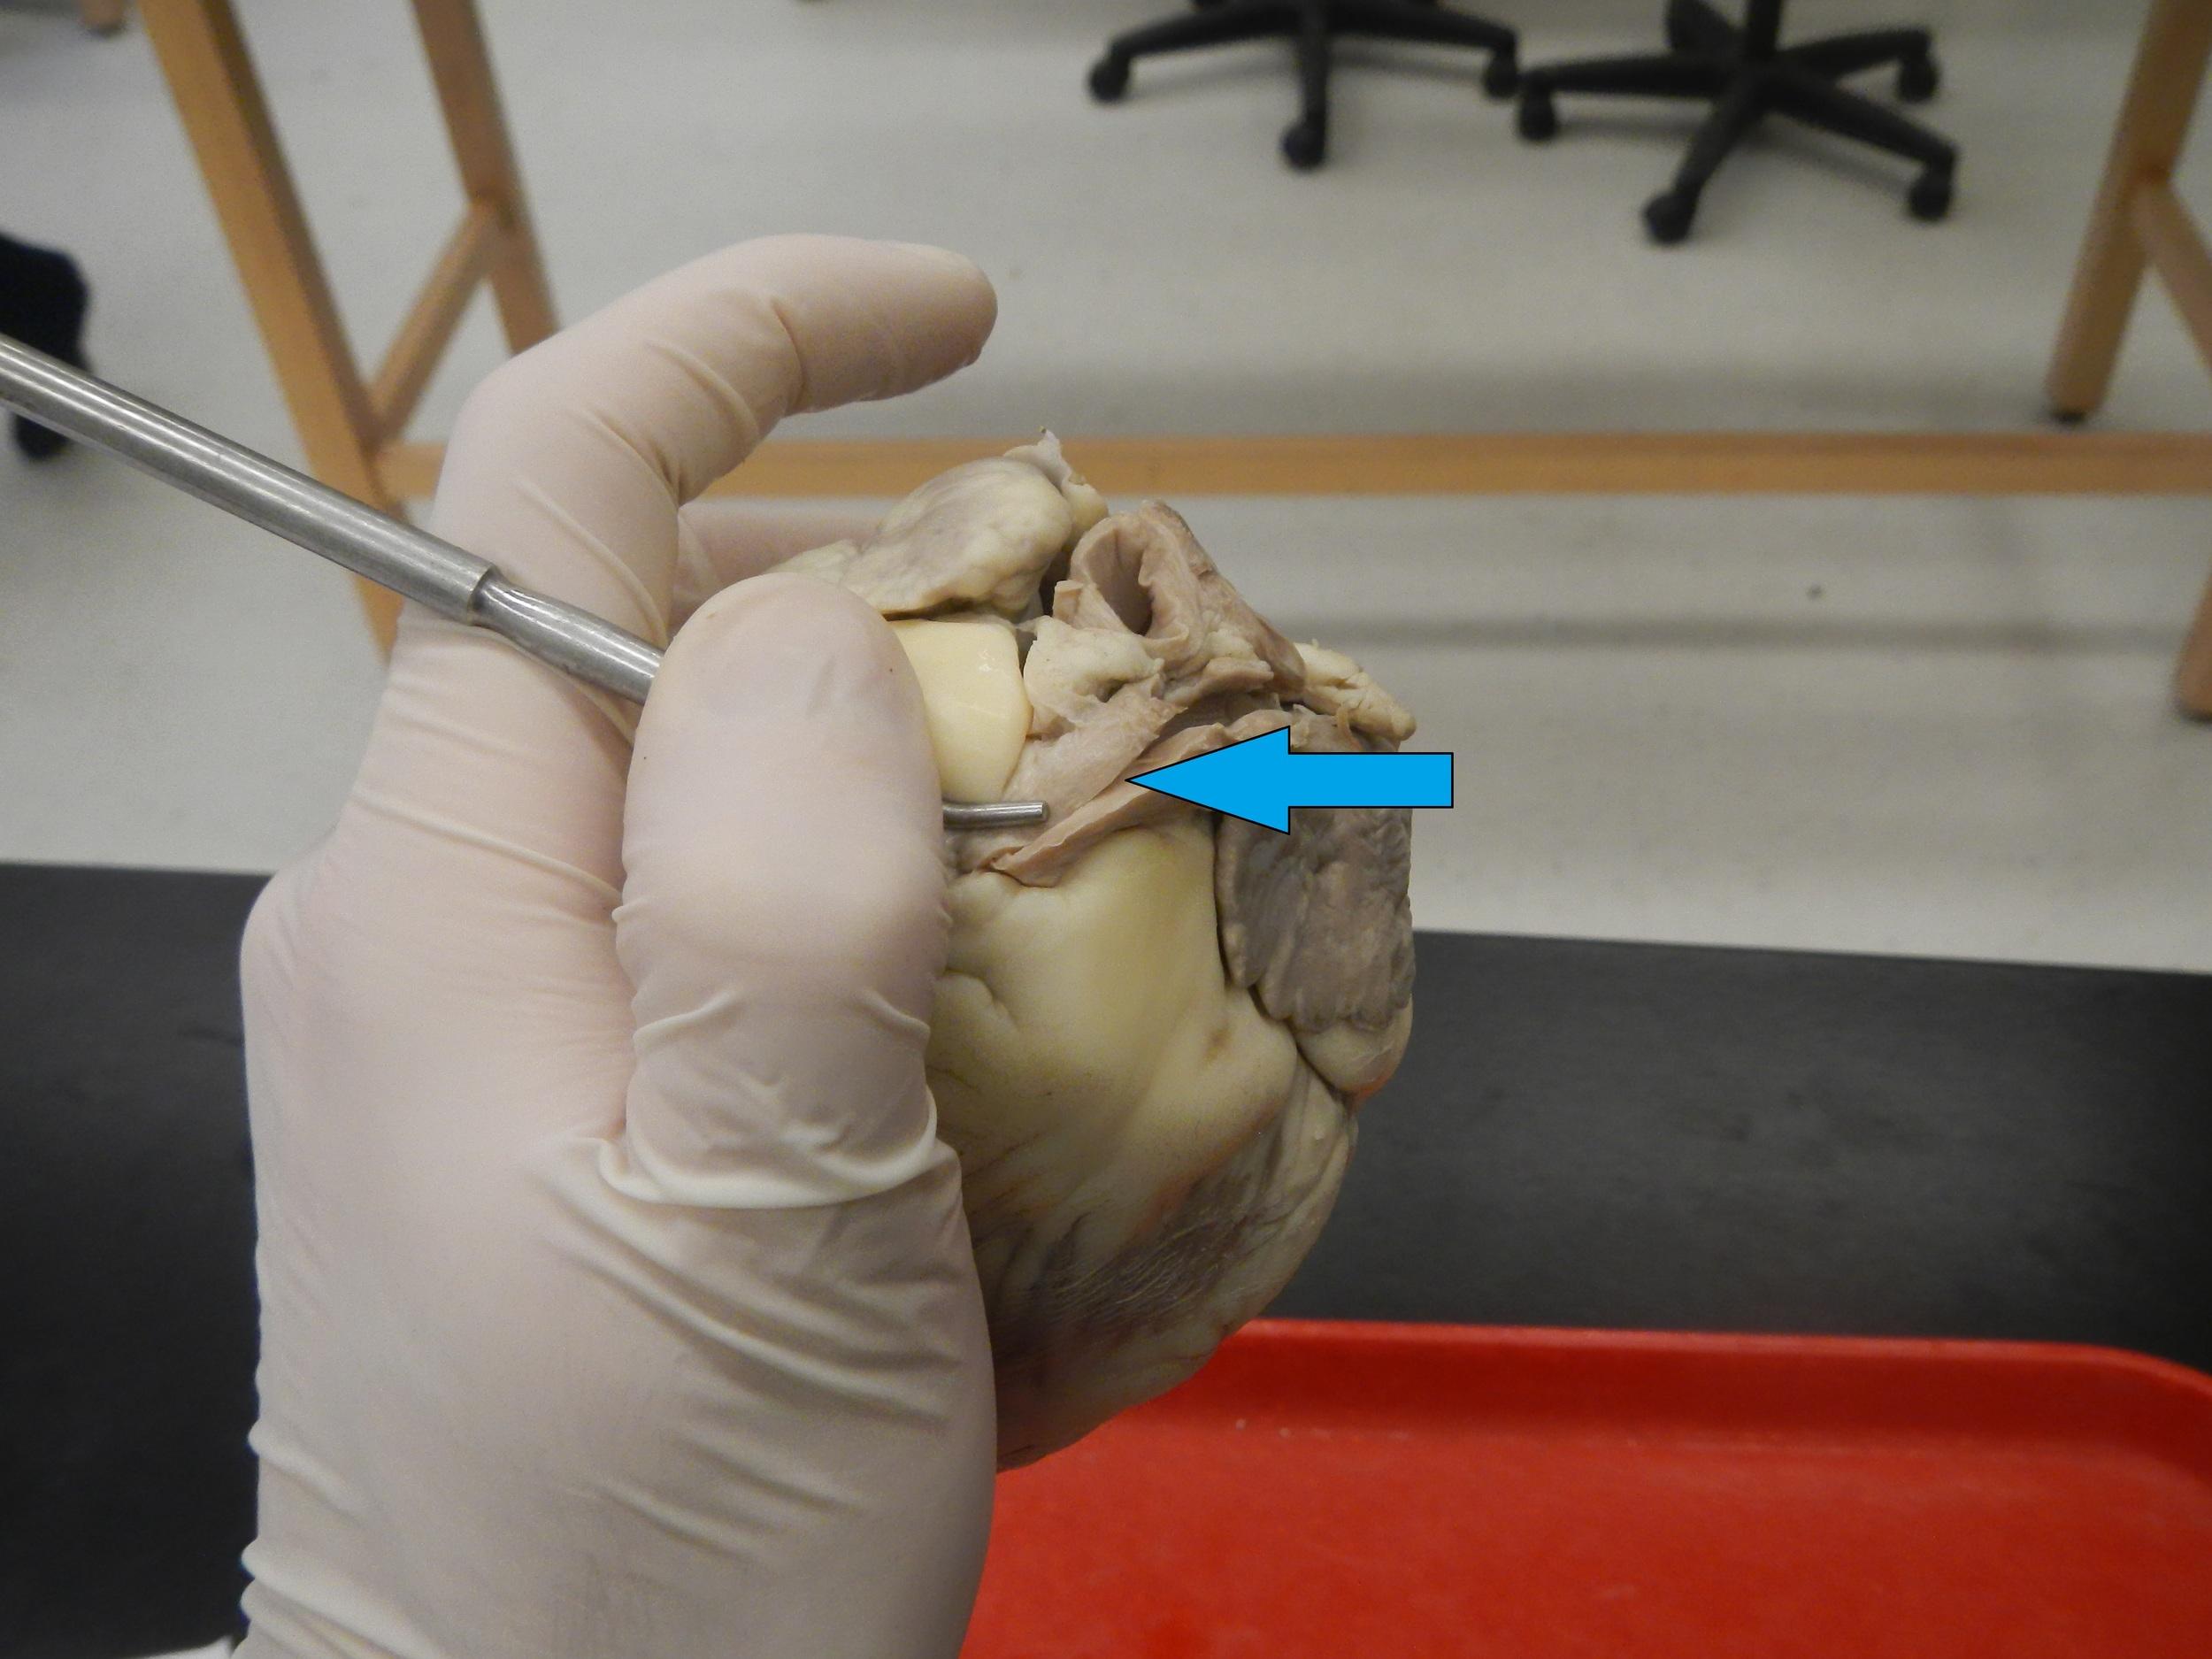 Blue - Pulmonary Artery